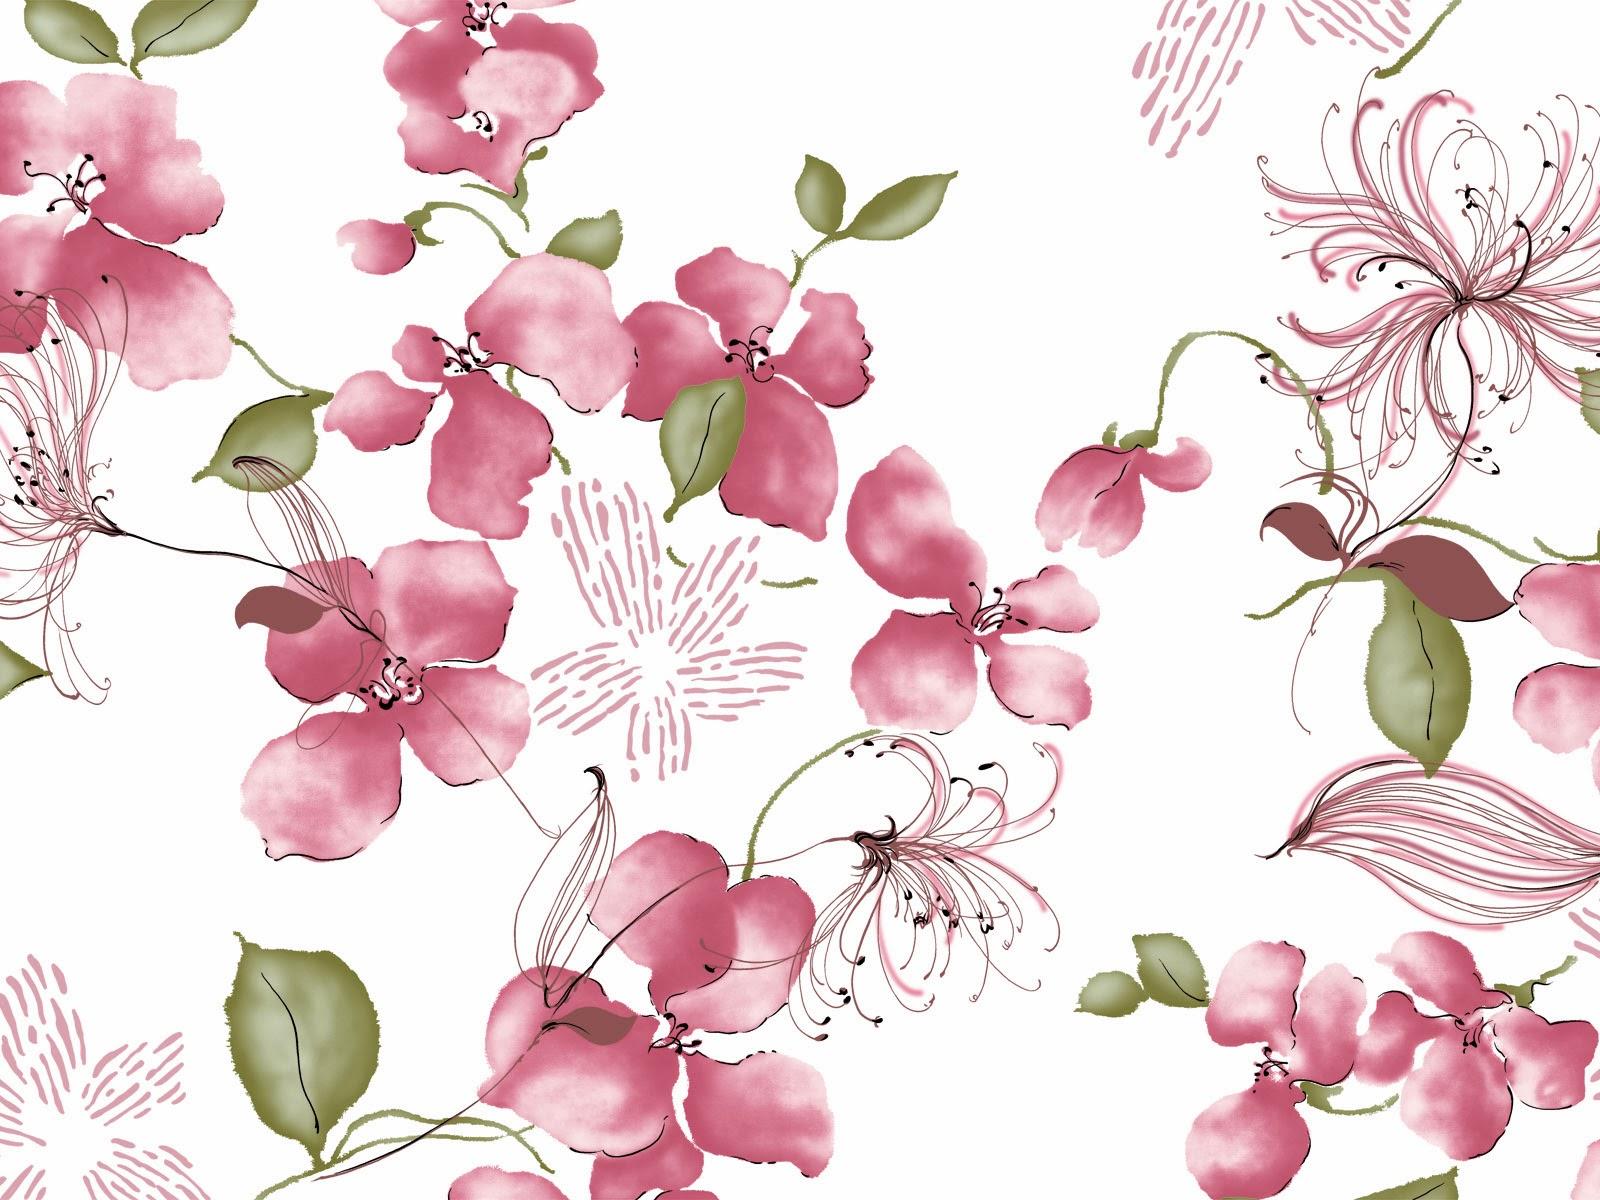 Download 8000 Wallpaper Bunga Vintage Hd HD Terbaru